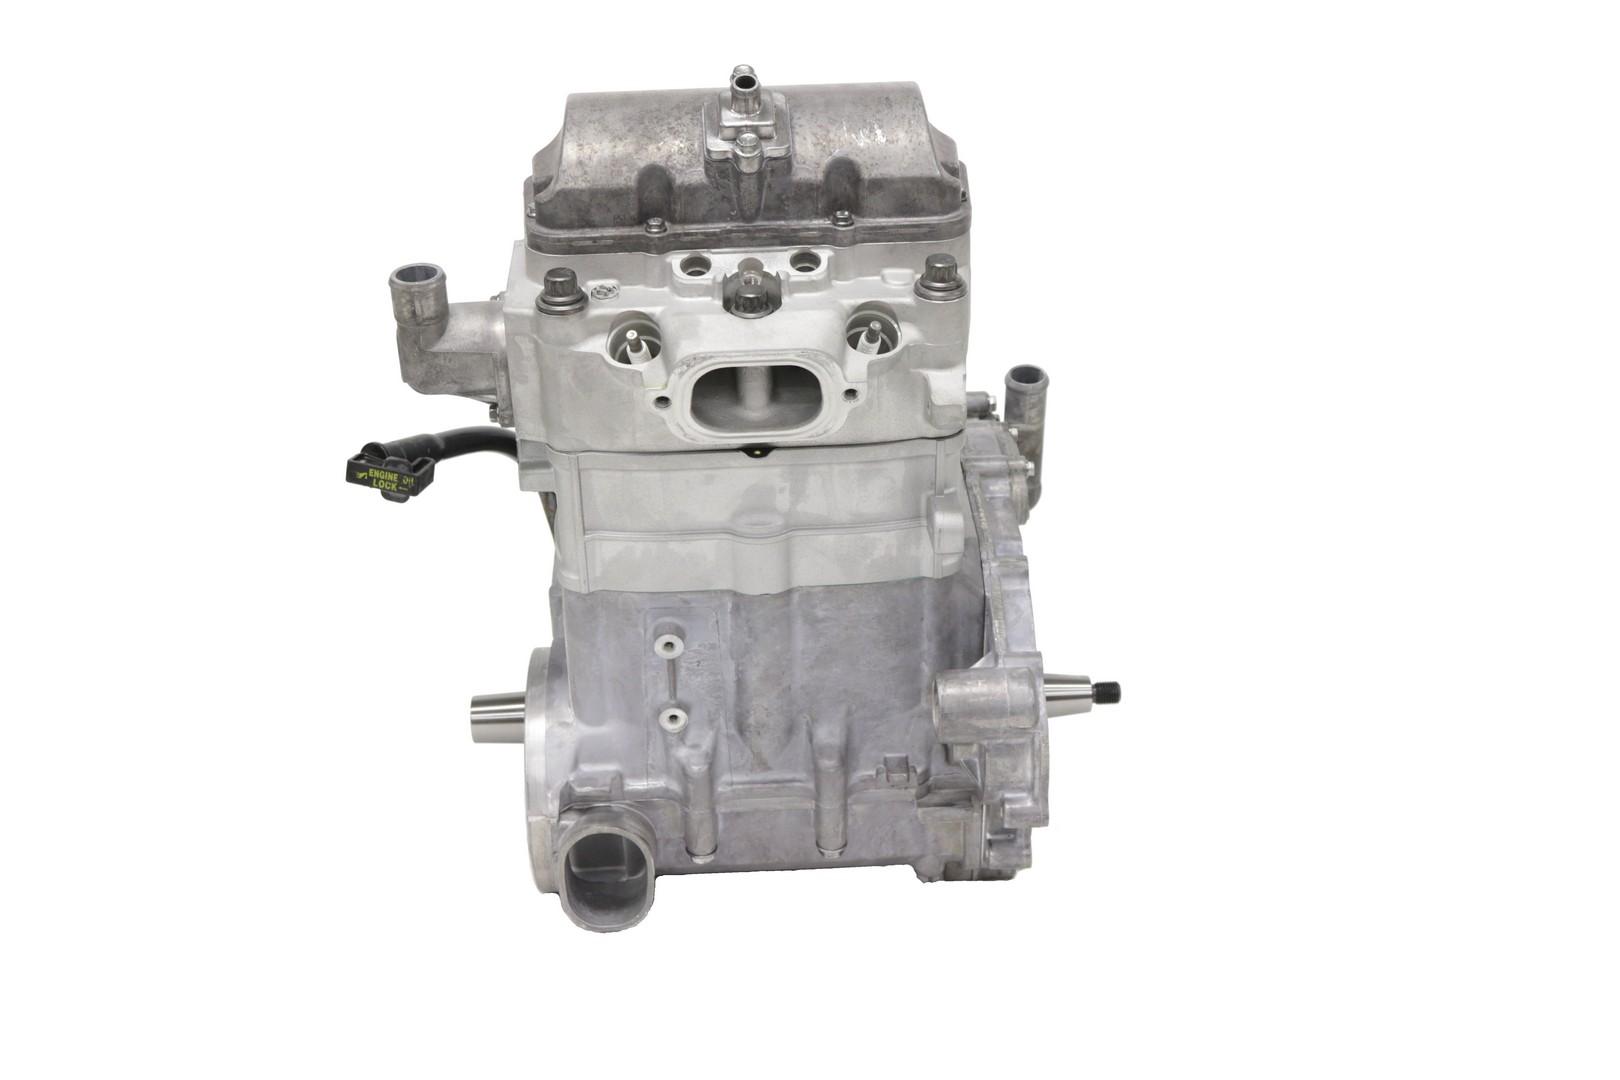 Polaris Ranger 800 11 16 4x4 6x6 Crew Engine Motor Rebuilt Ebay